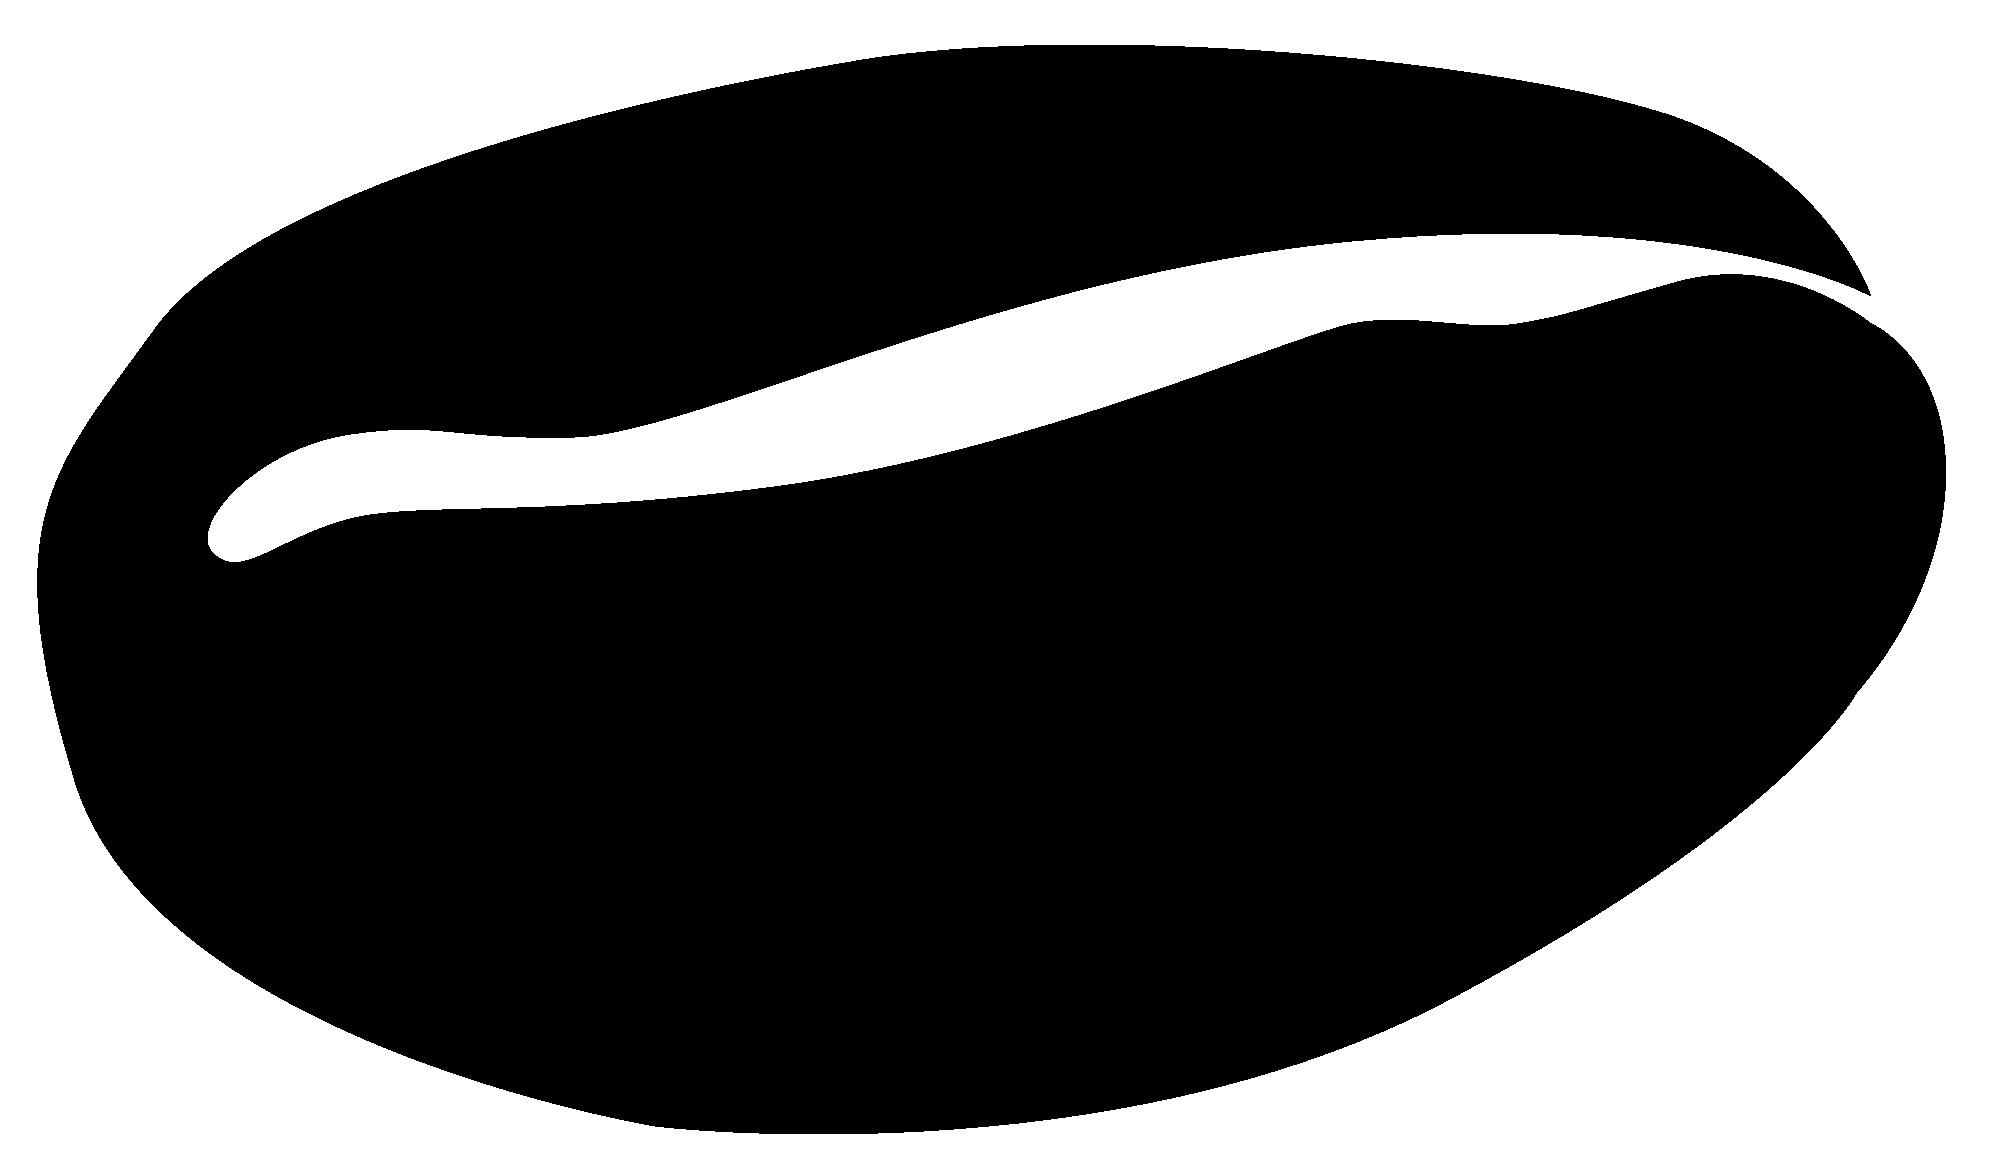 Bean clipart vector. Coffee beans on white